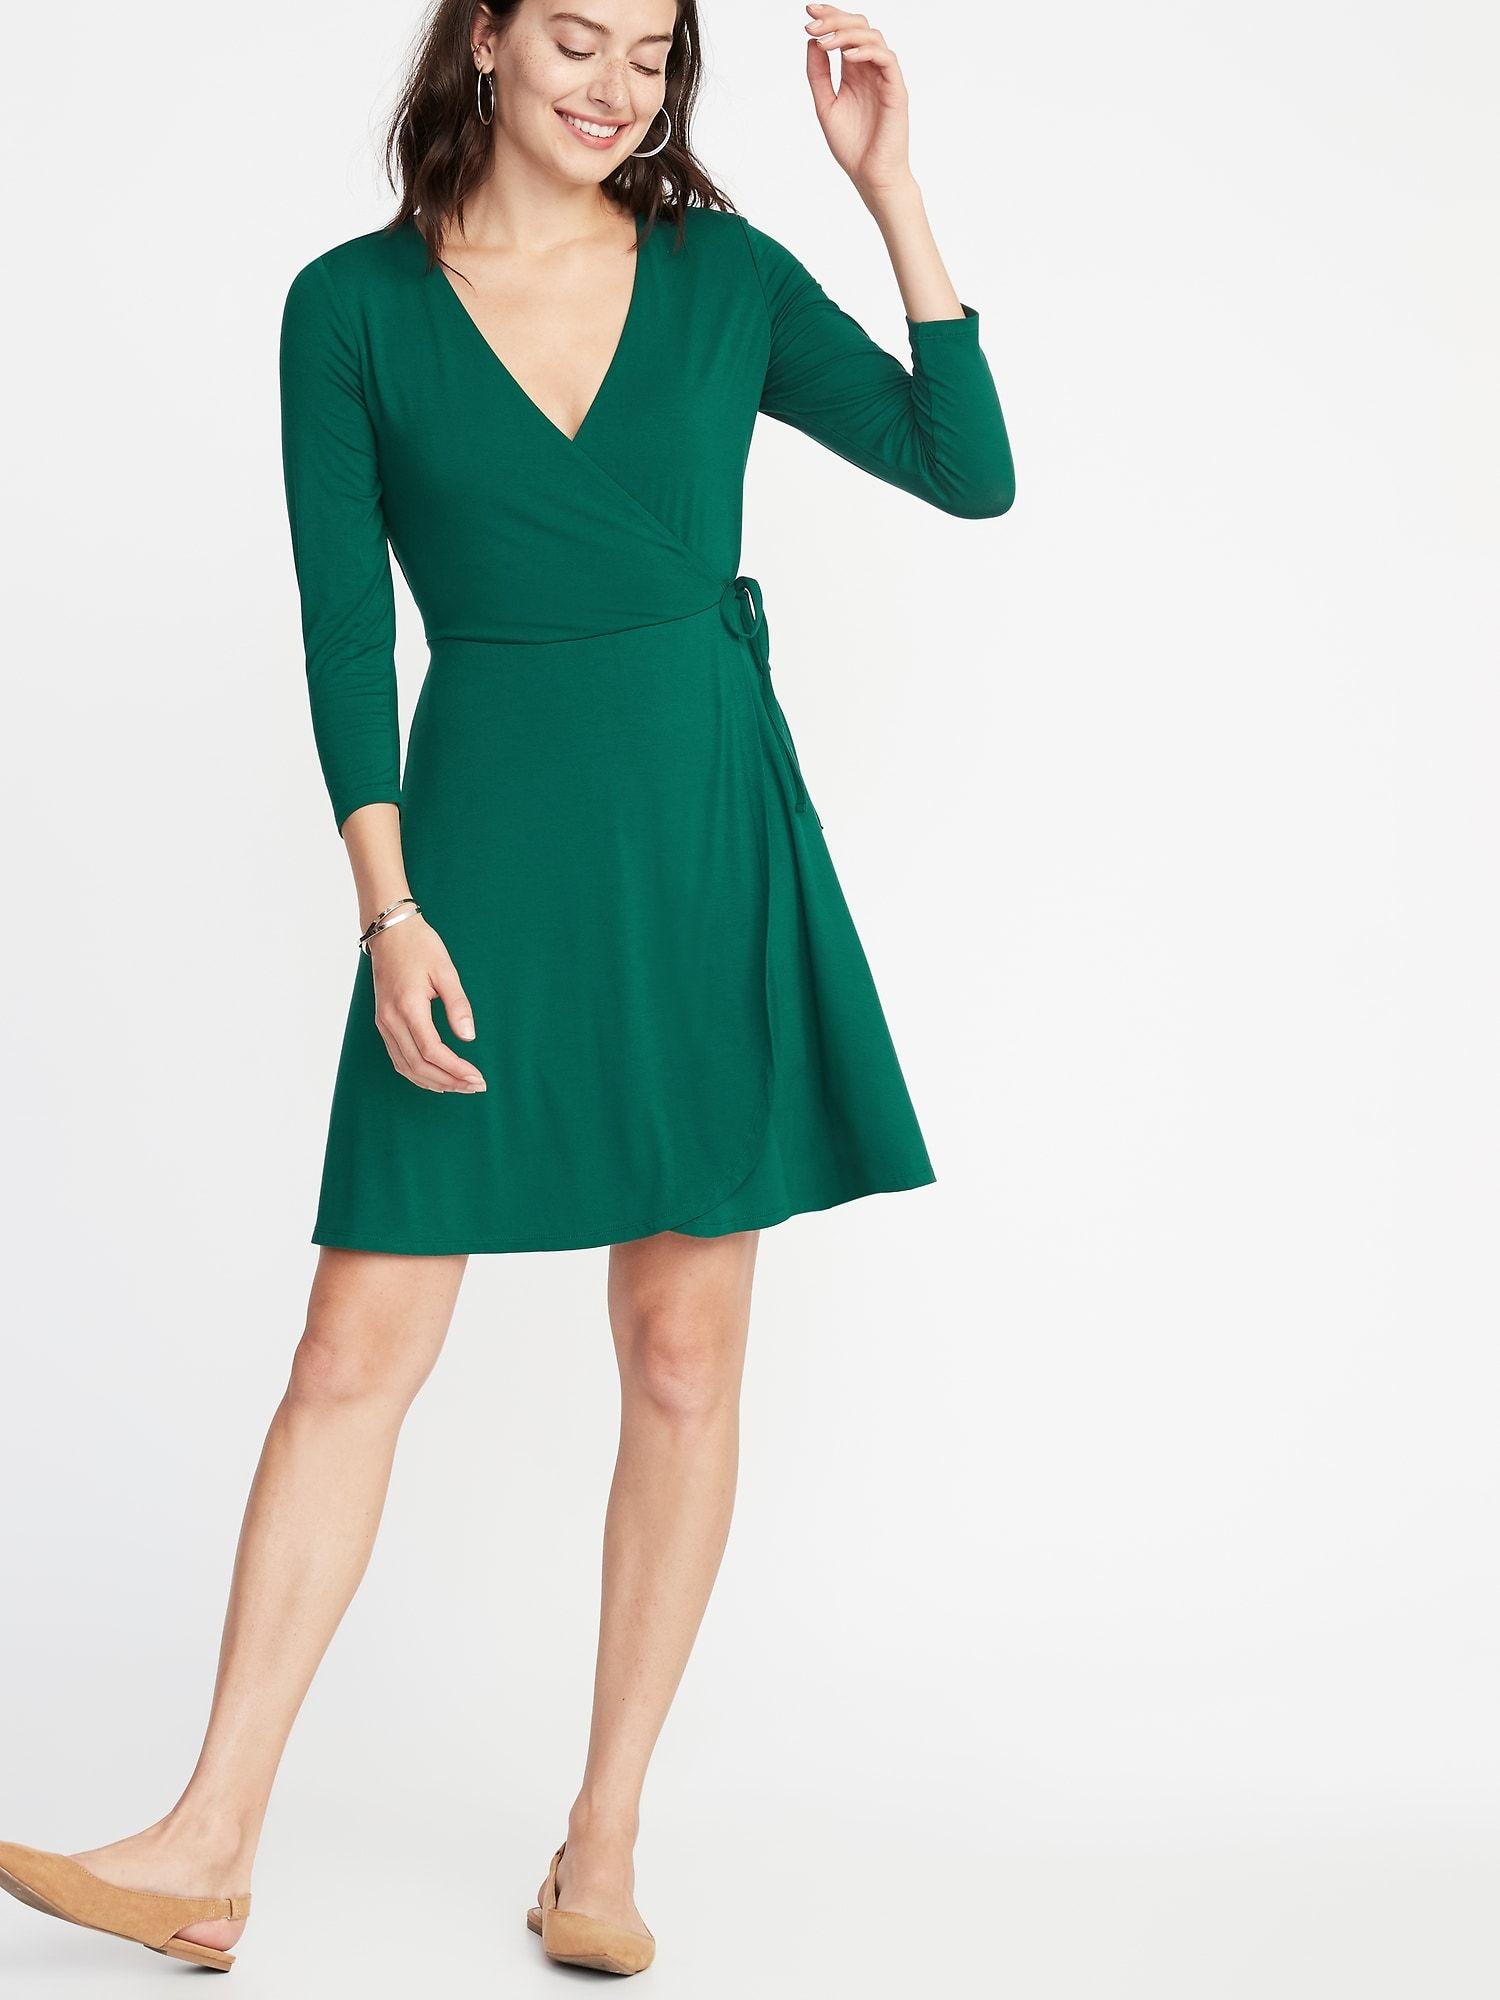 Waist Defined Wrap Front Dress For Women Old Navy Wrap Front Dress Womens Dresses Evening Dresses Uk [ 2000 x 1500 Pixel ]